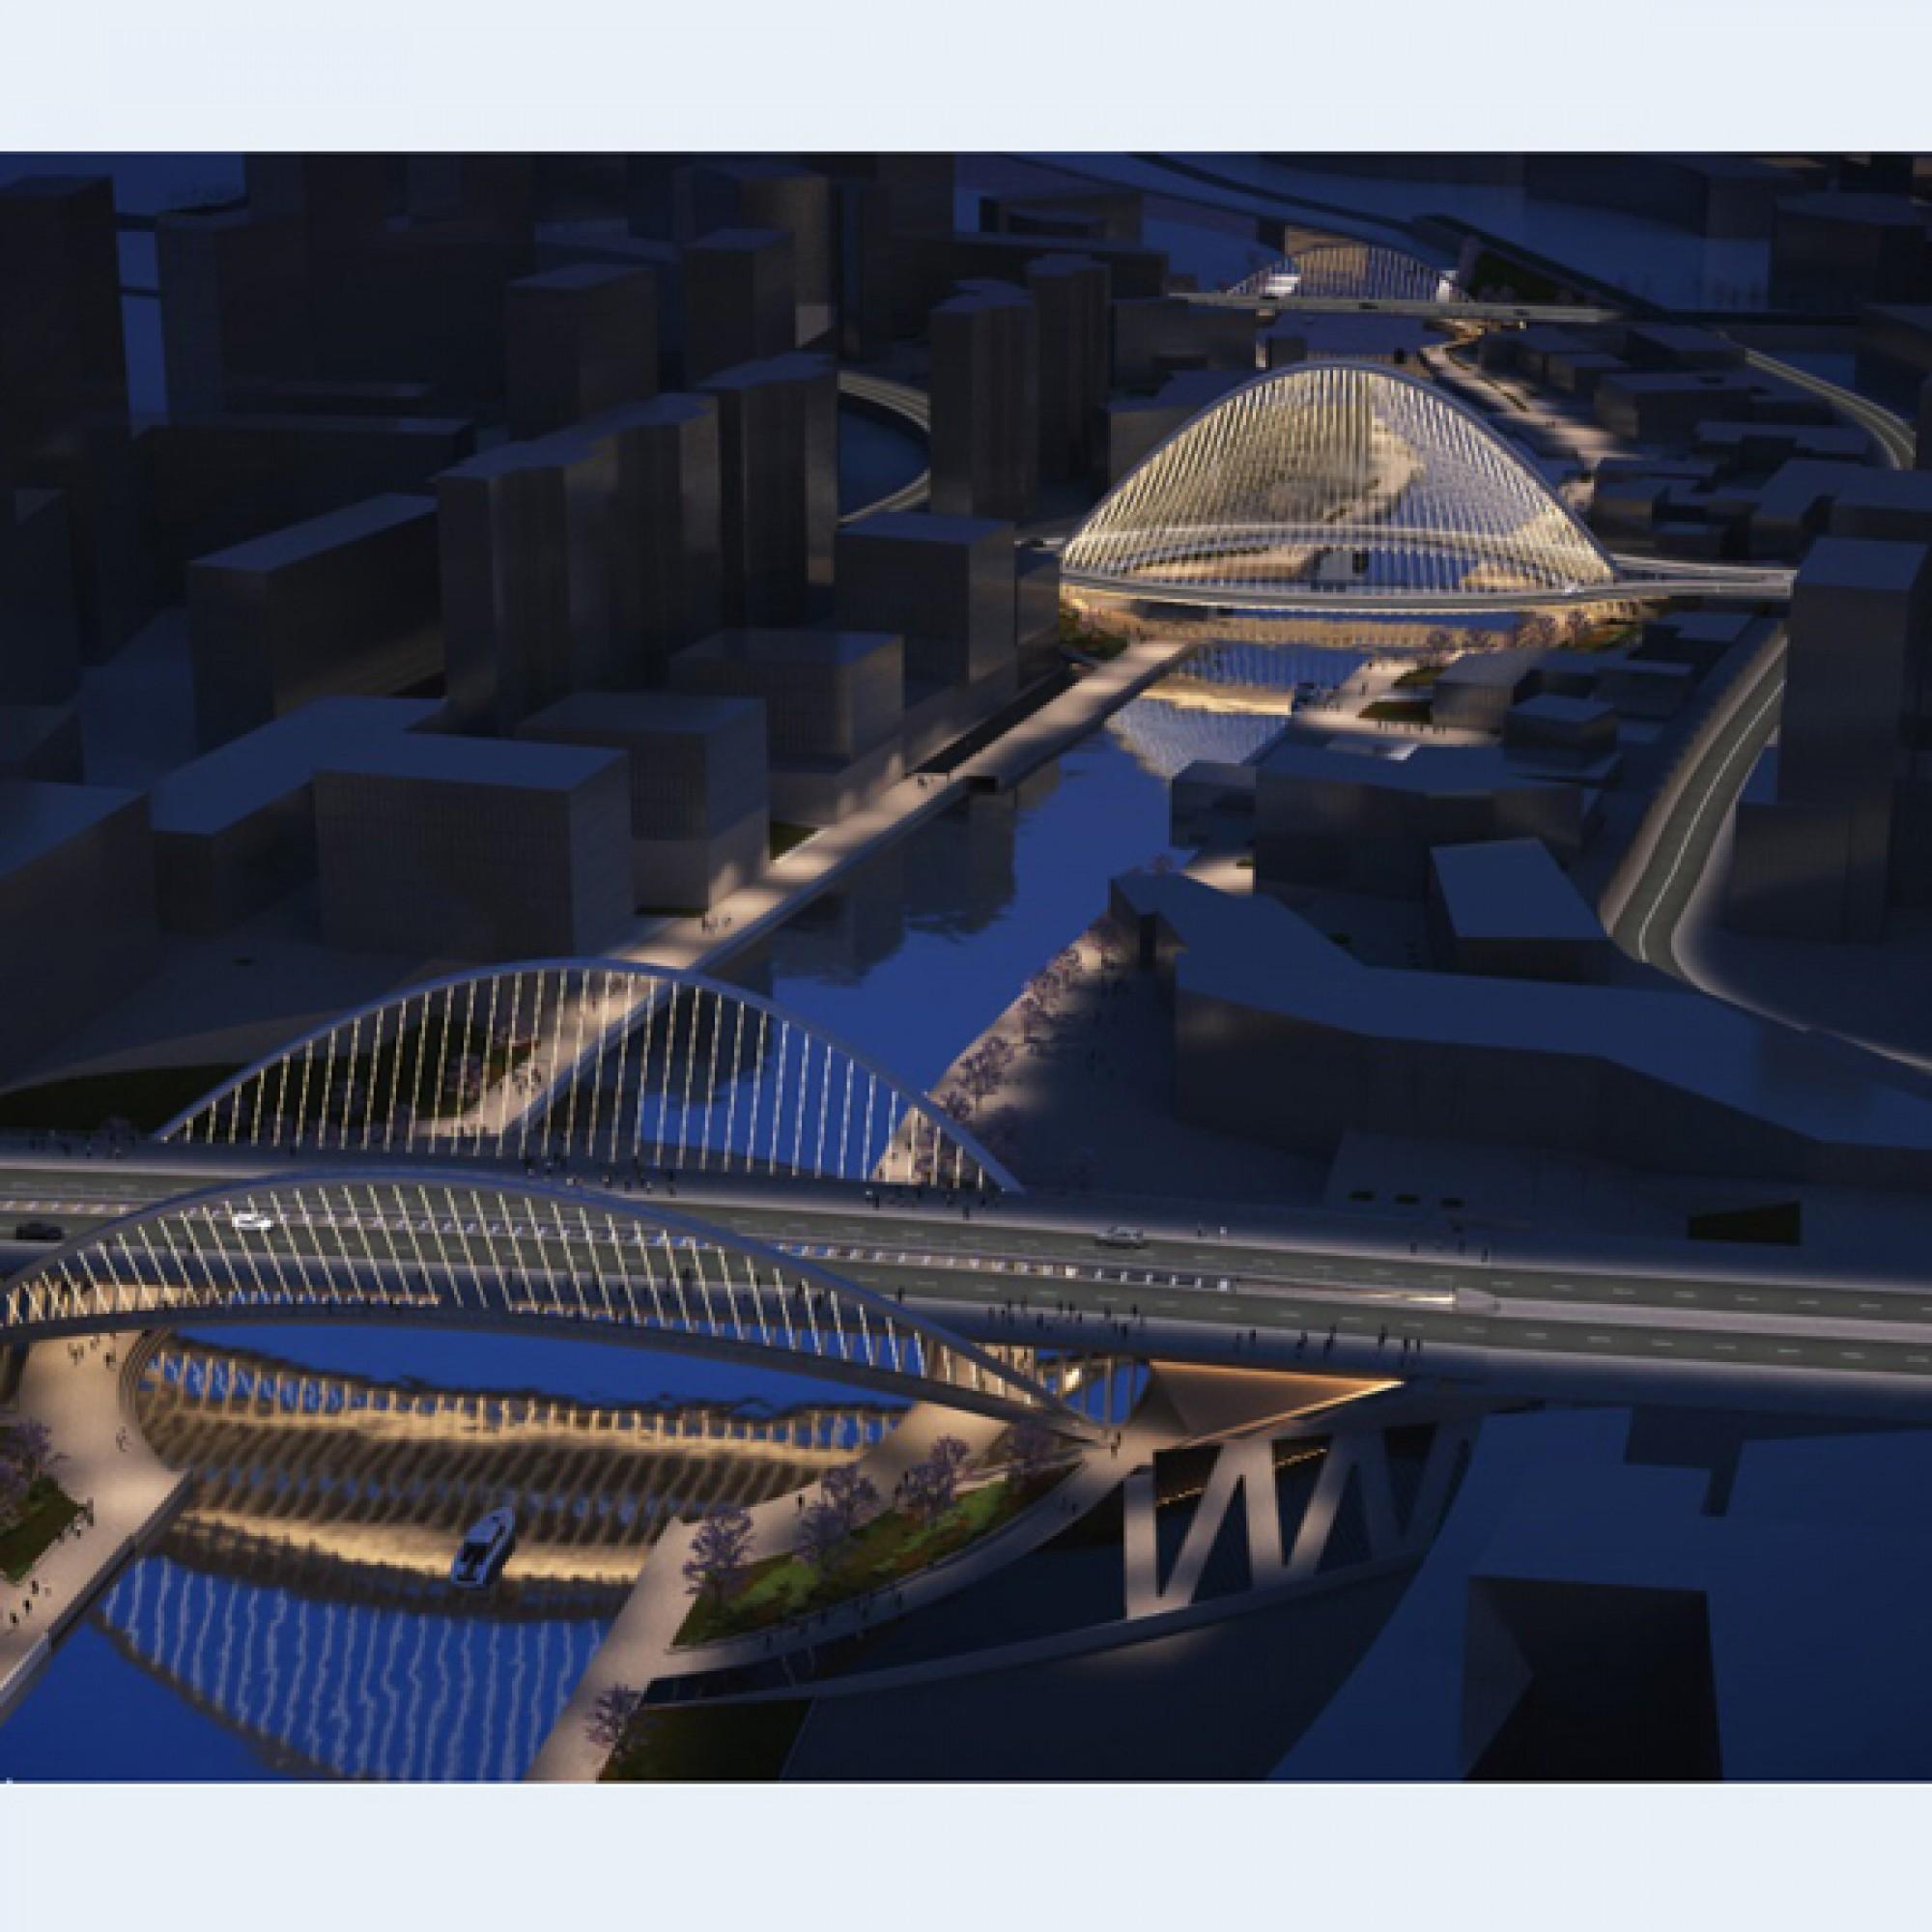 Das Brücken-Ensemble bei Nacht (Bilder: Santiago Calatrava LLC)       1/6